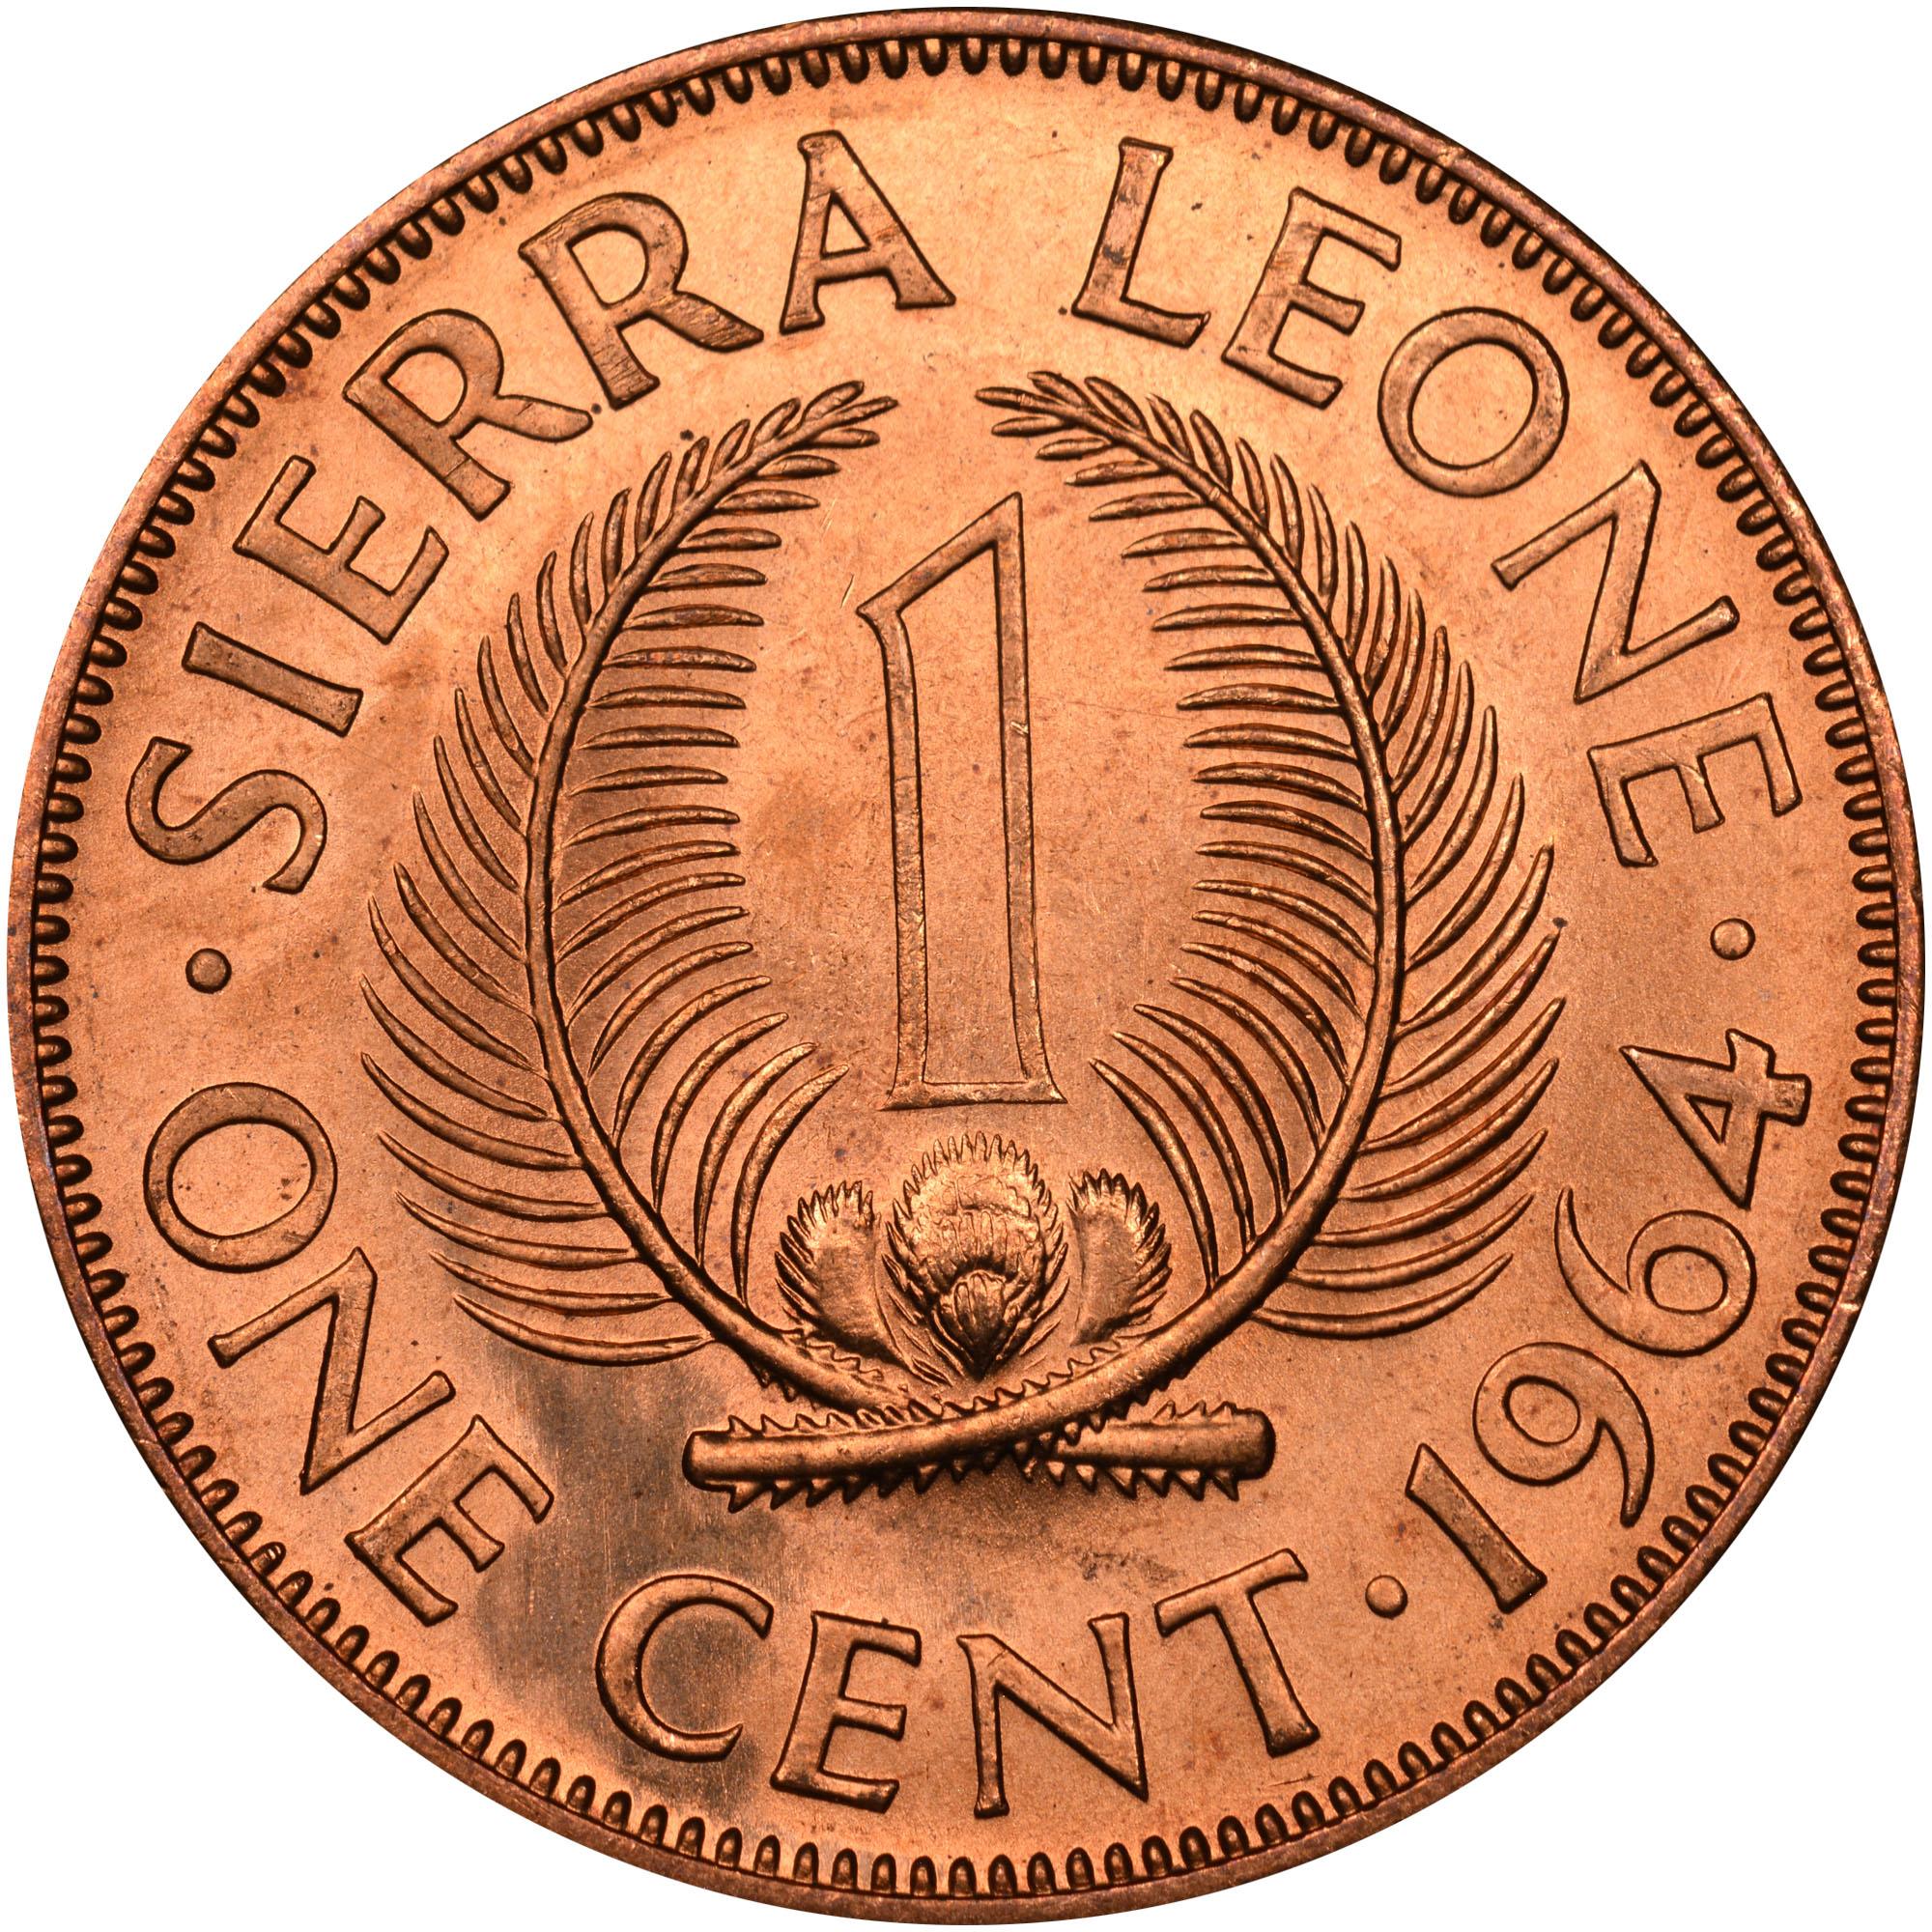 Sierra leone cent km 17 prices values ngc sierra leone cent obverse biocorpaavc